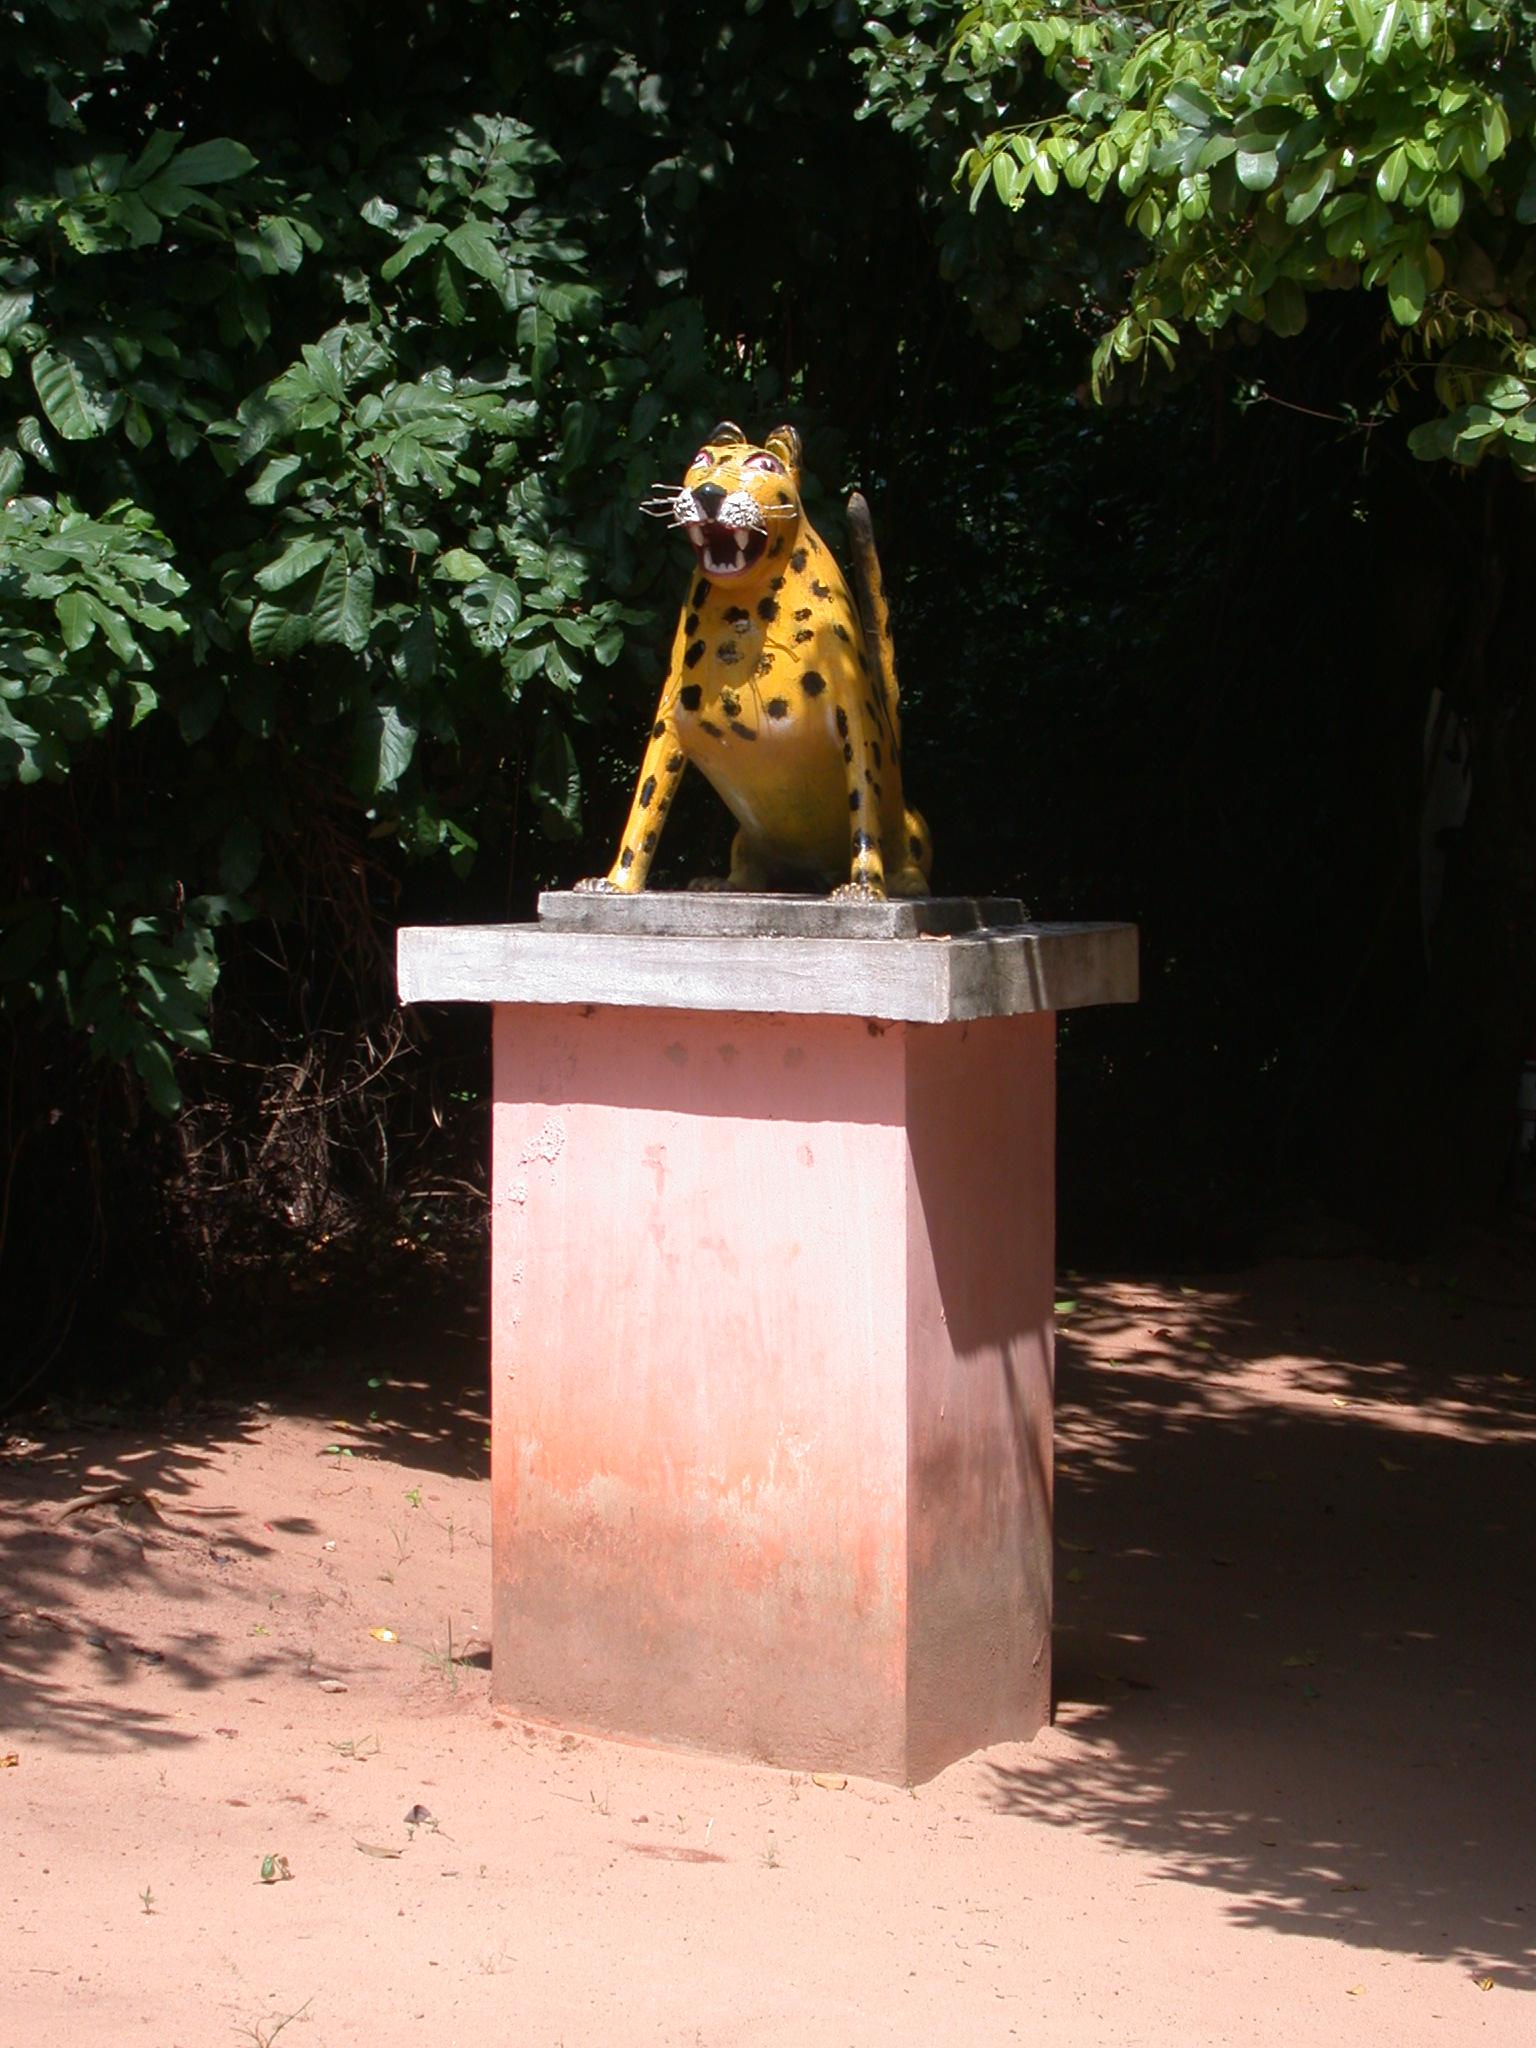 Jaguar Sculpture, Kpasse Sacred Forest, Ouidah, Benin